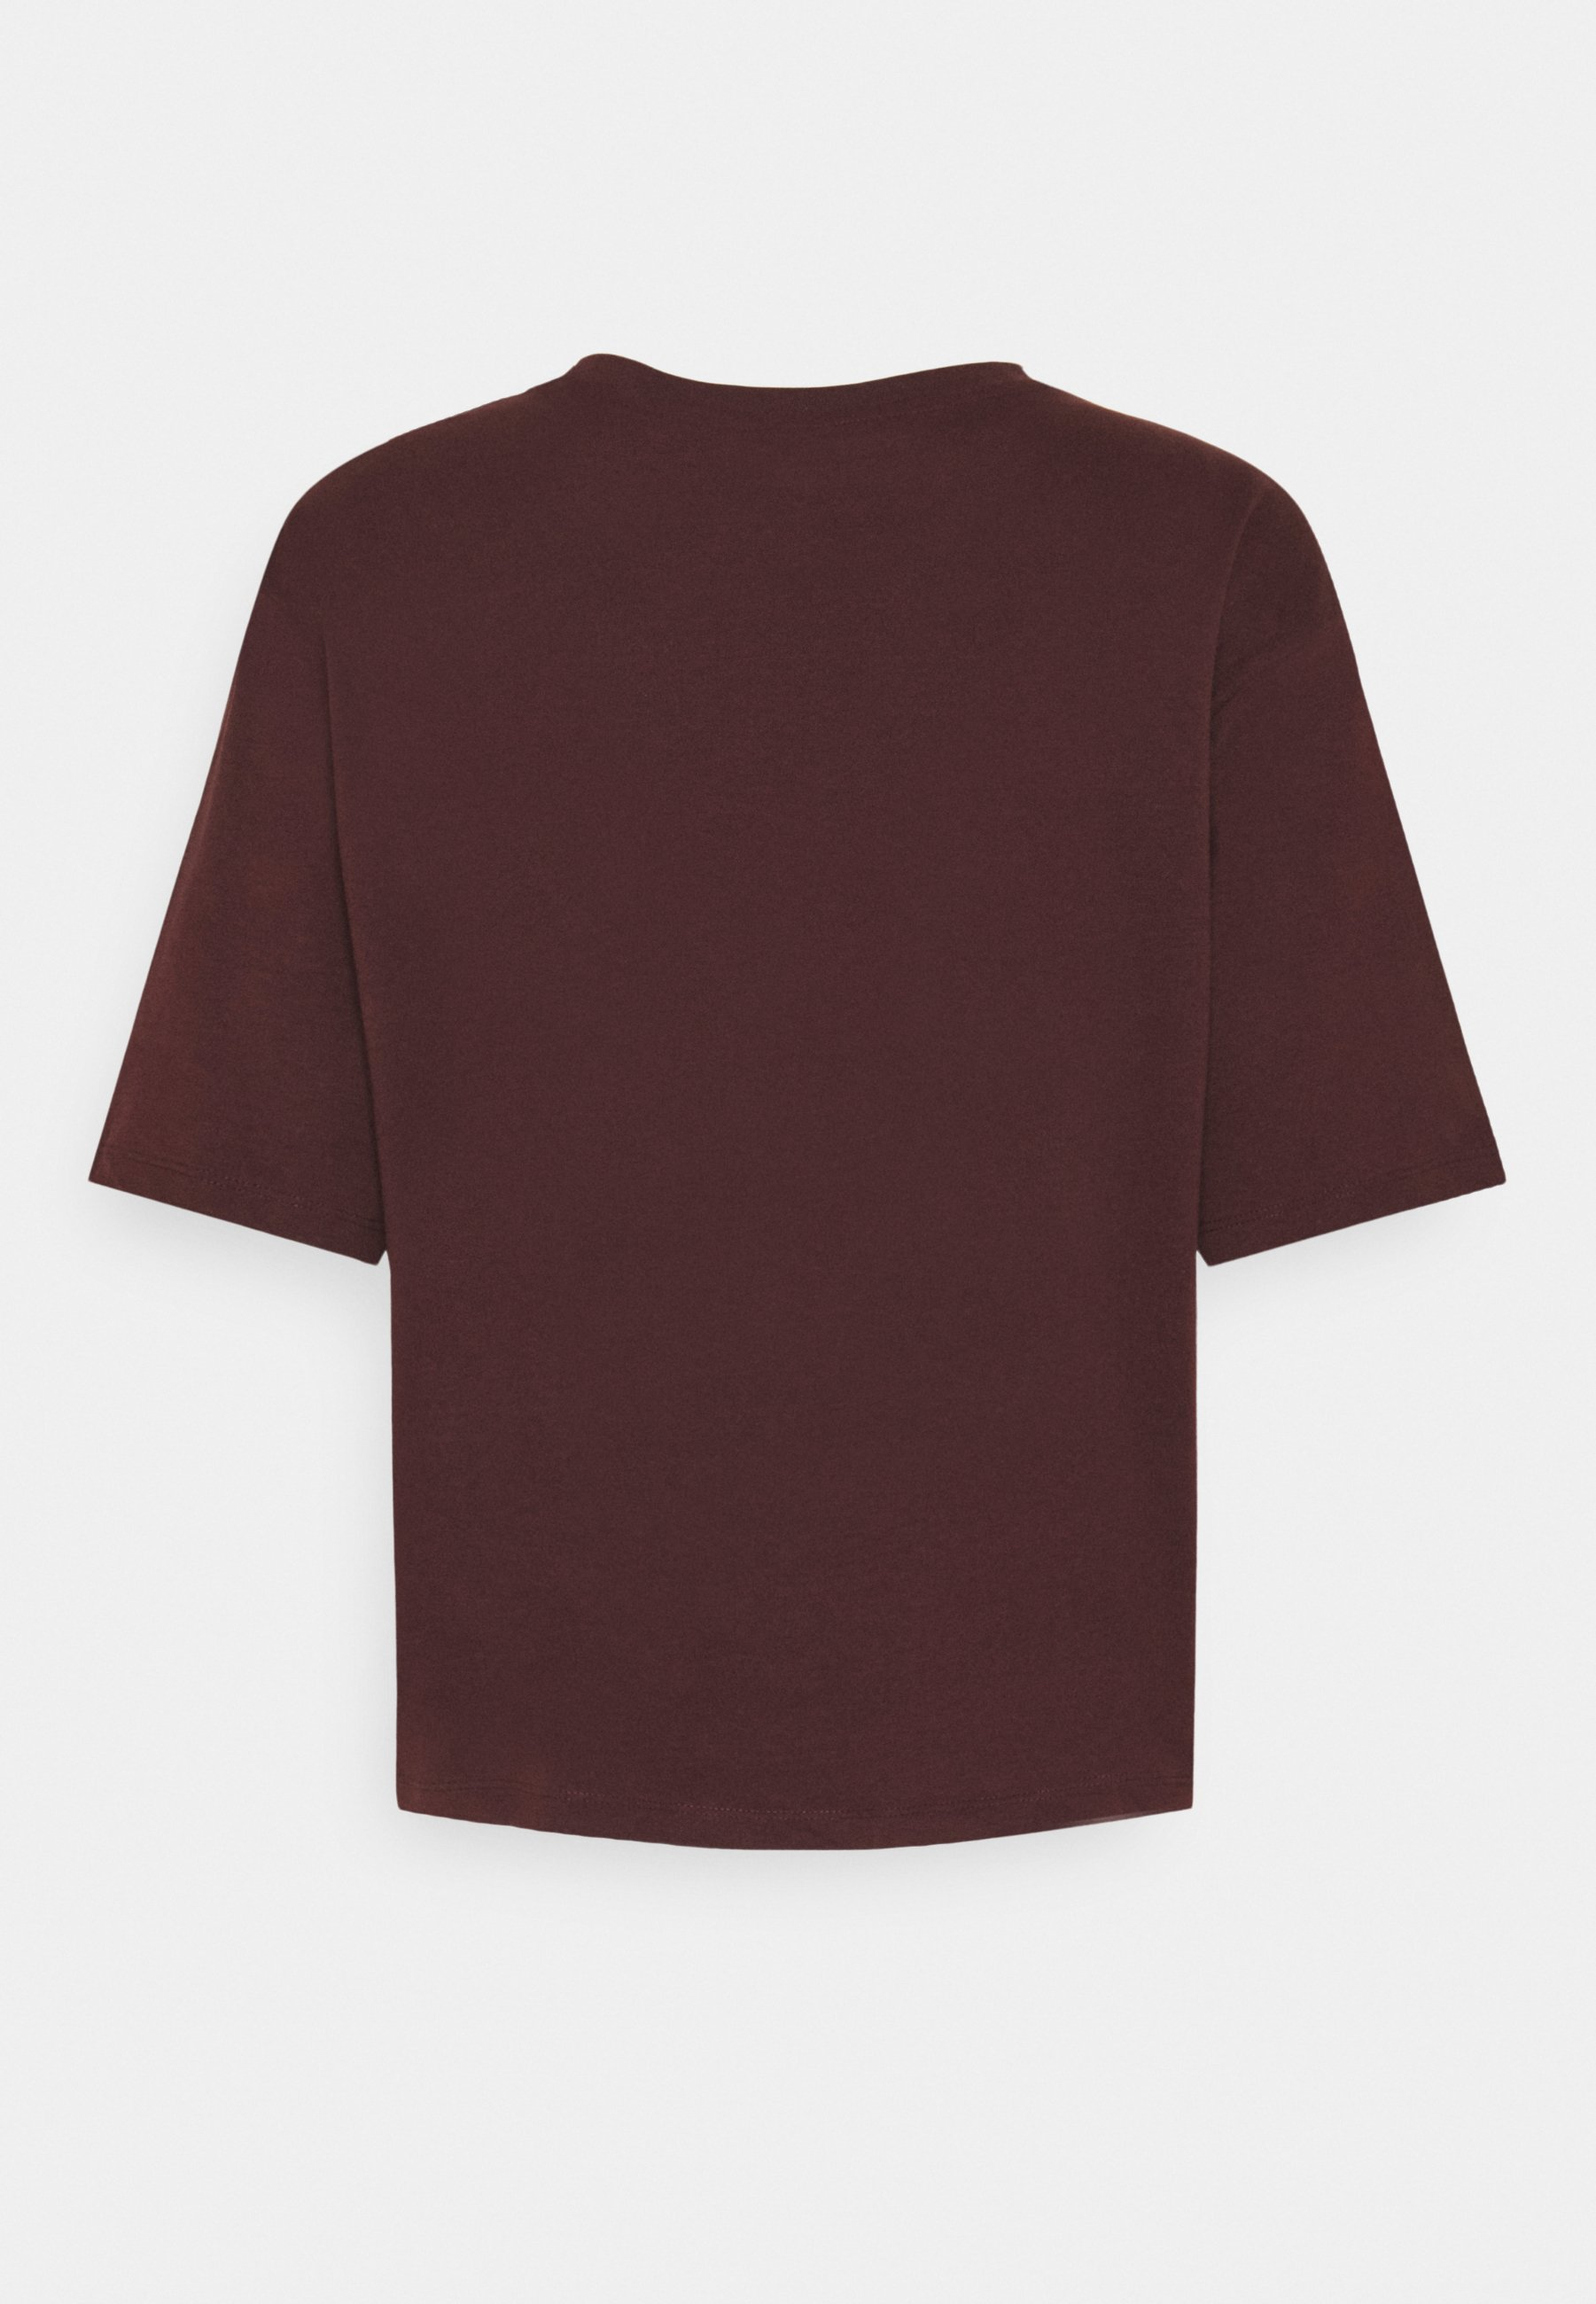 Pieces Pcrume Tee - T-shirts Med Print Decadent Chocolate/mørkebrun